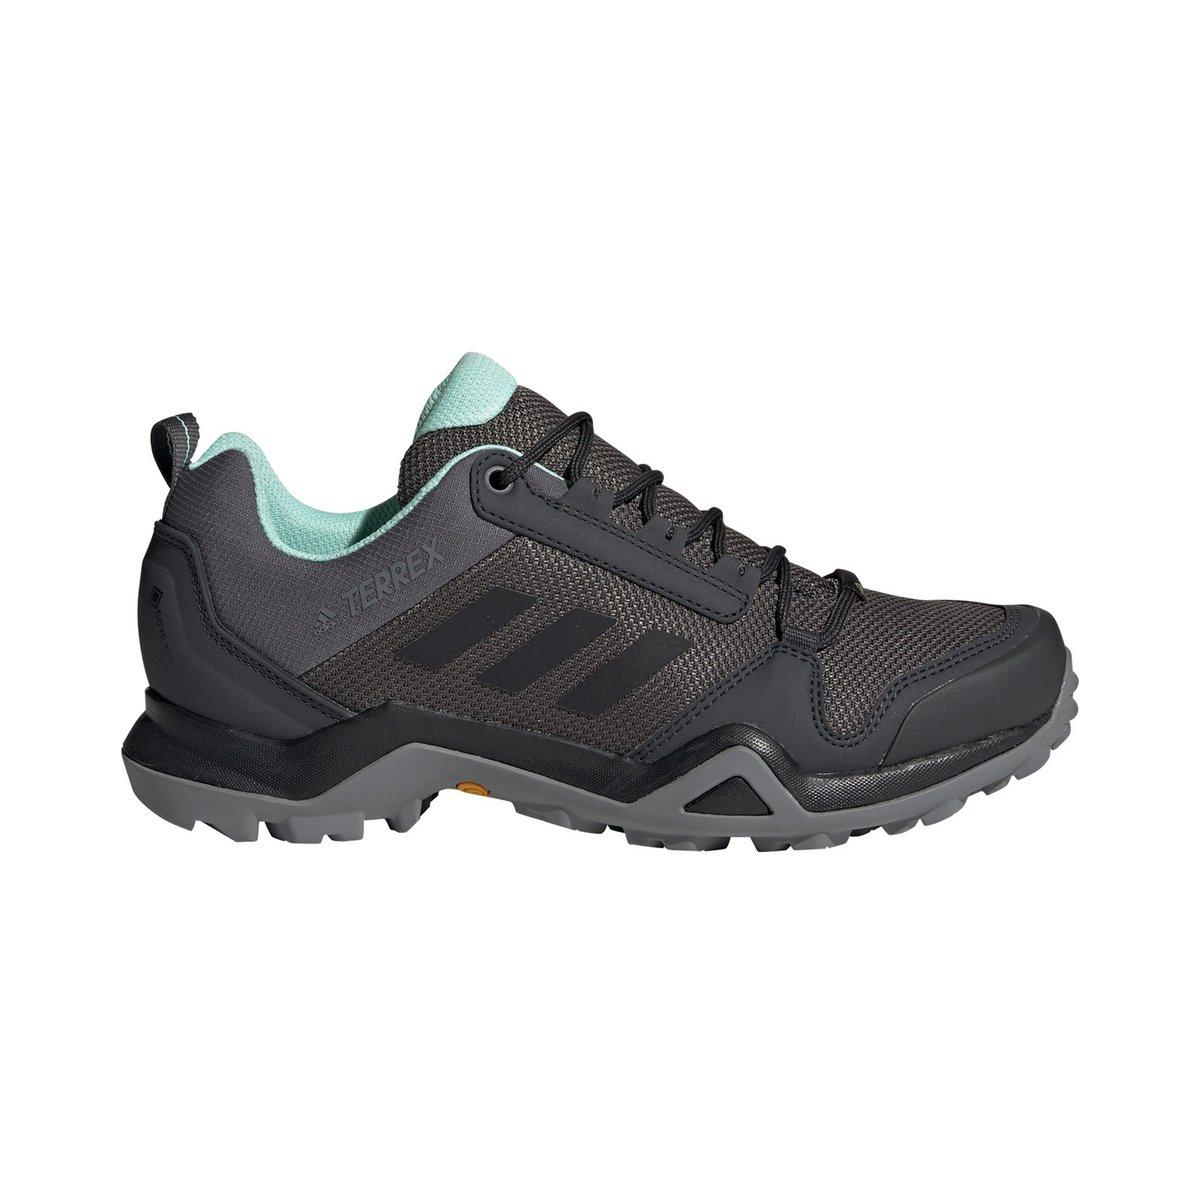 Adidas Terrex Women's Terrex AX3 GORE-TEX Walking Shoes 0